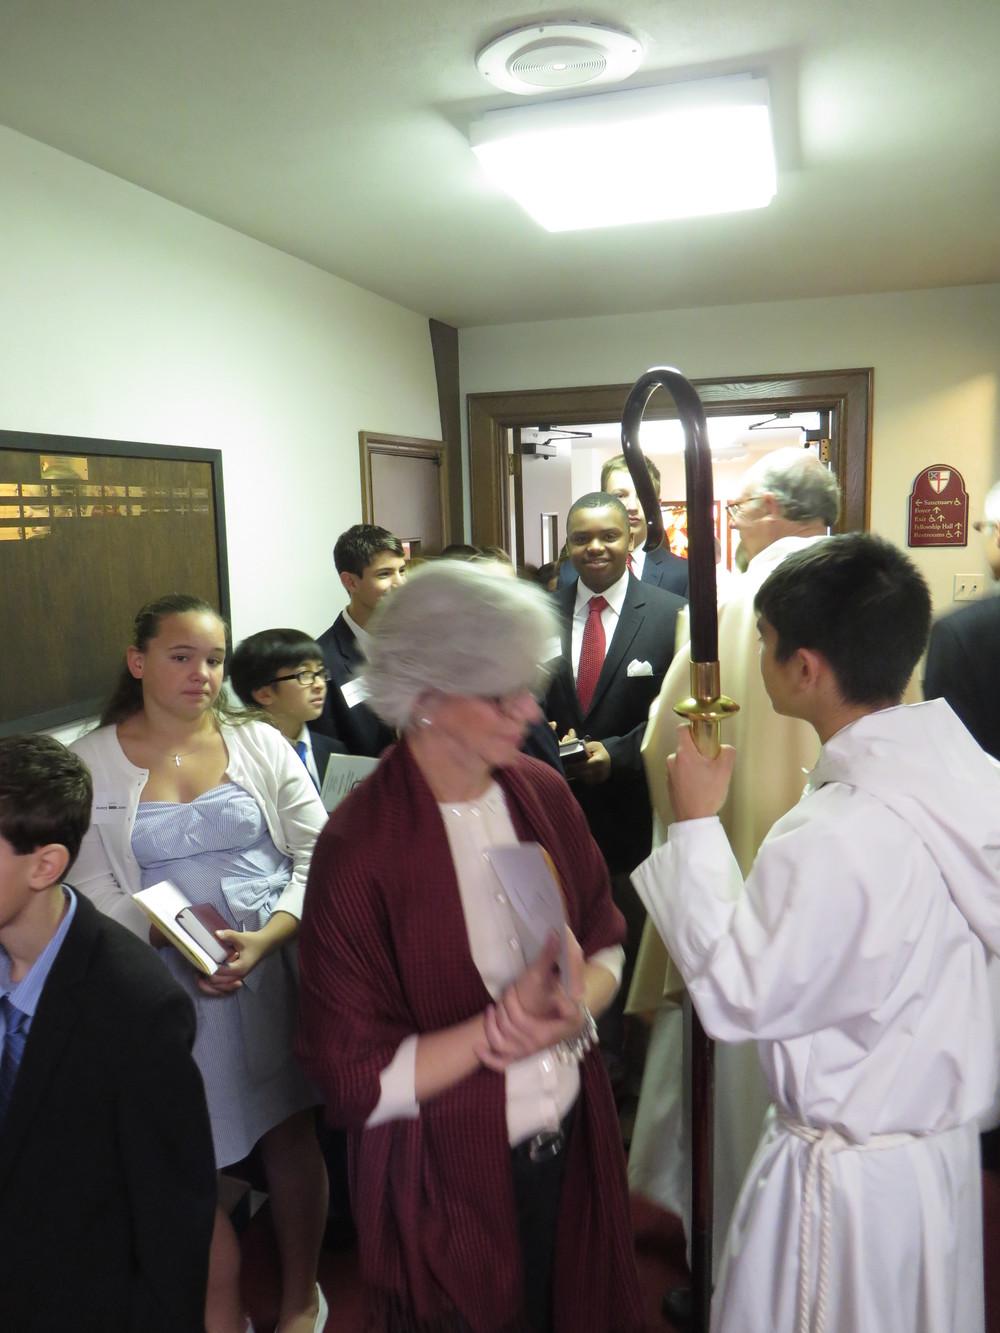 Confirmation with Bishop Daniel 11-16-14 002.JPG